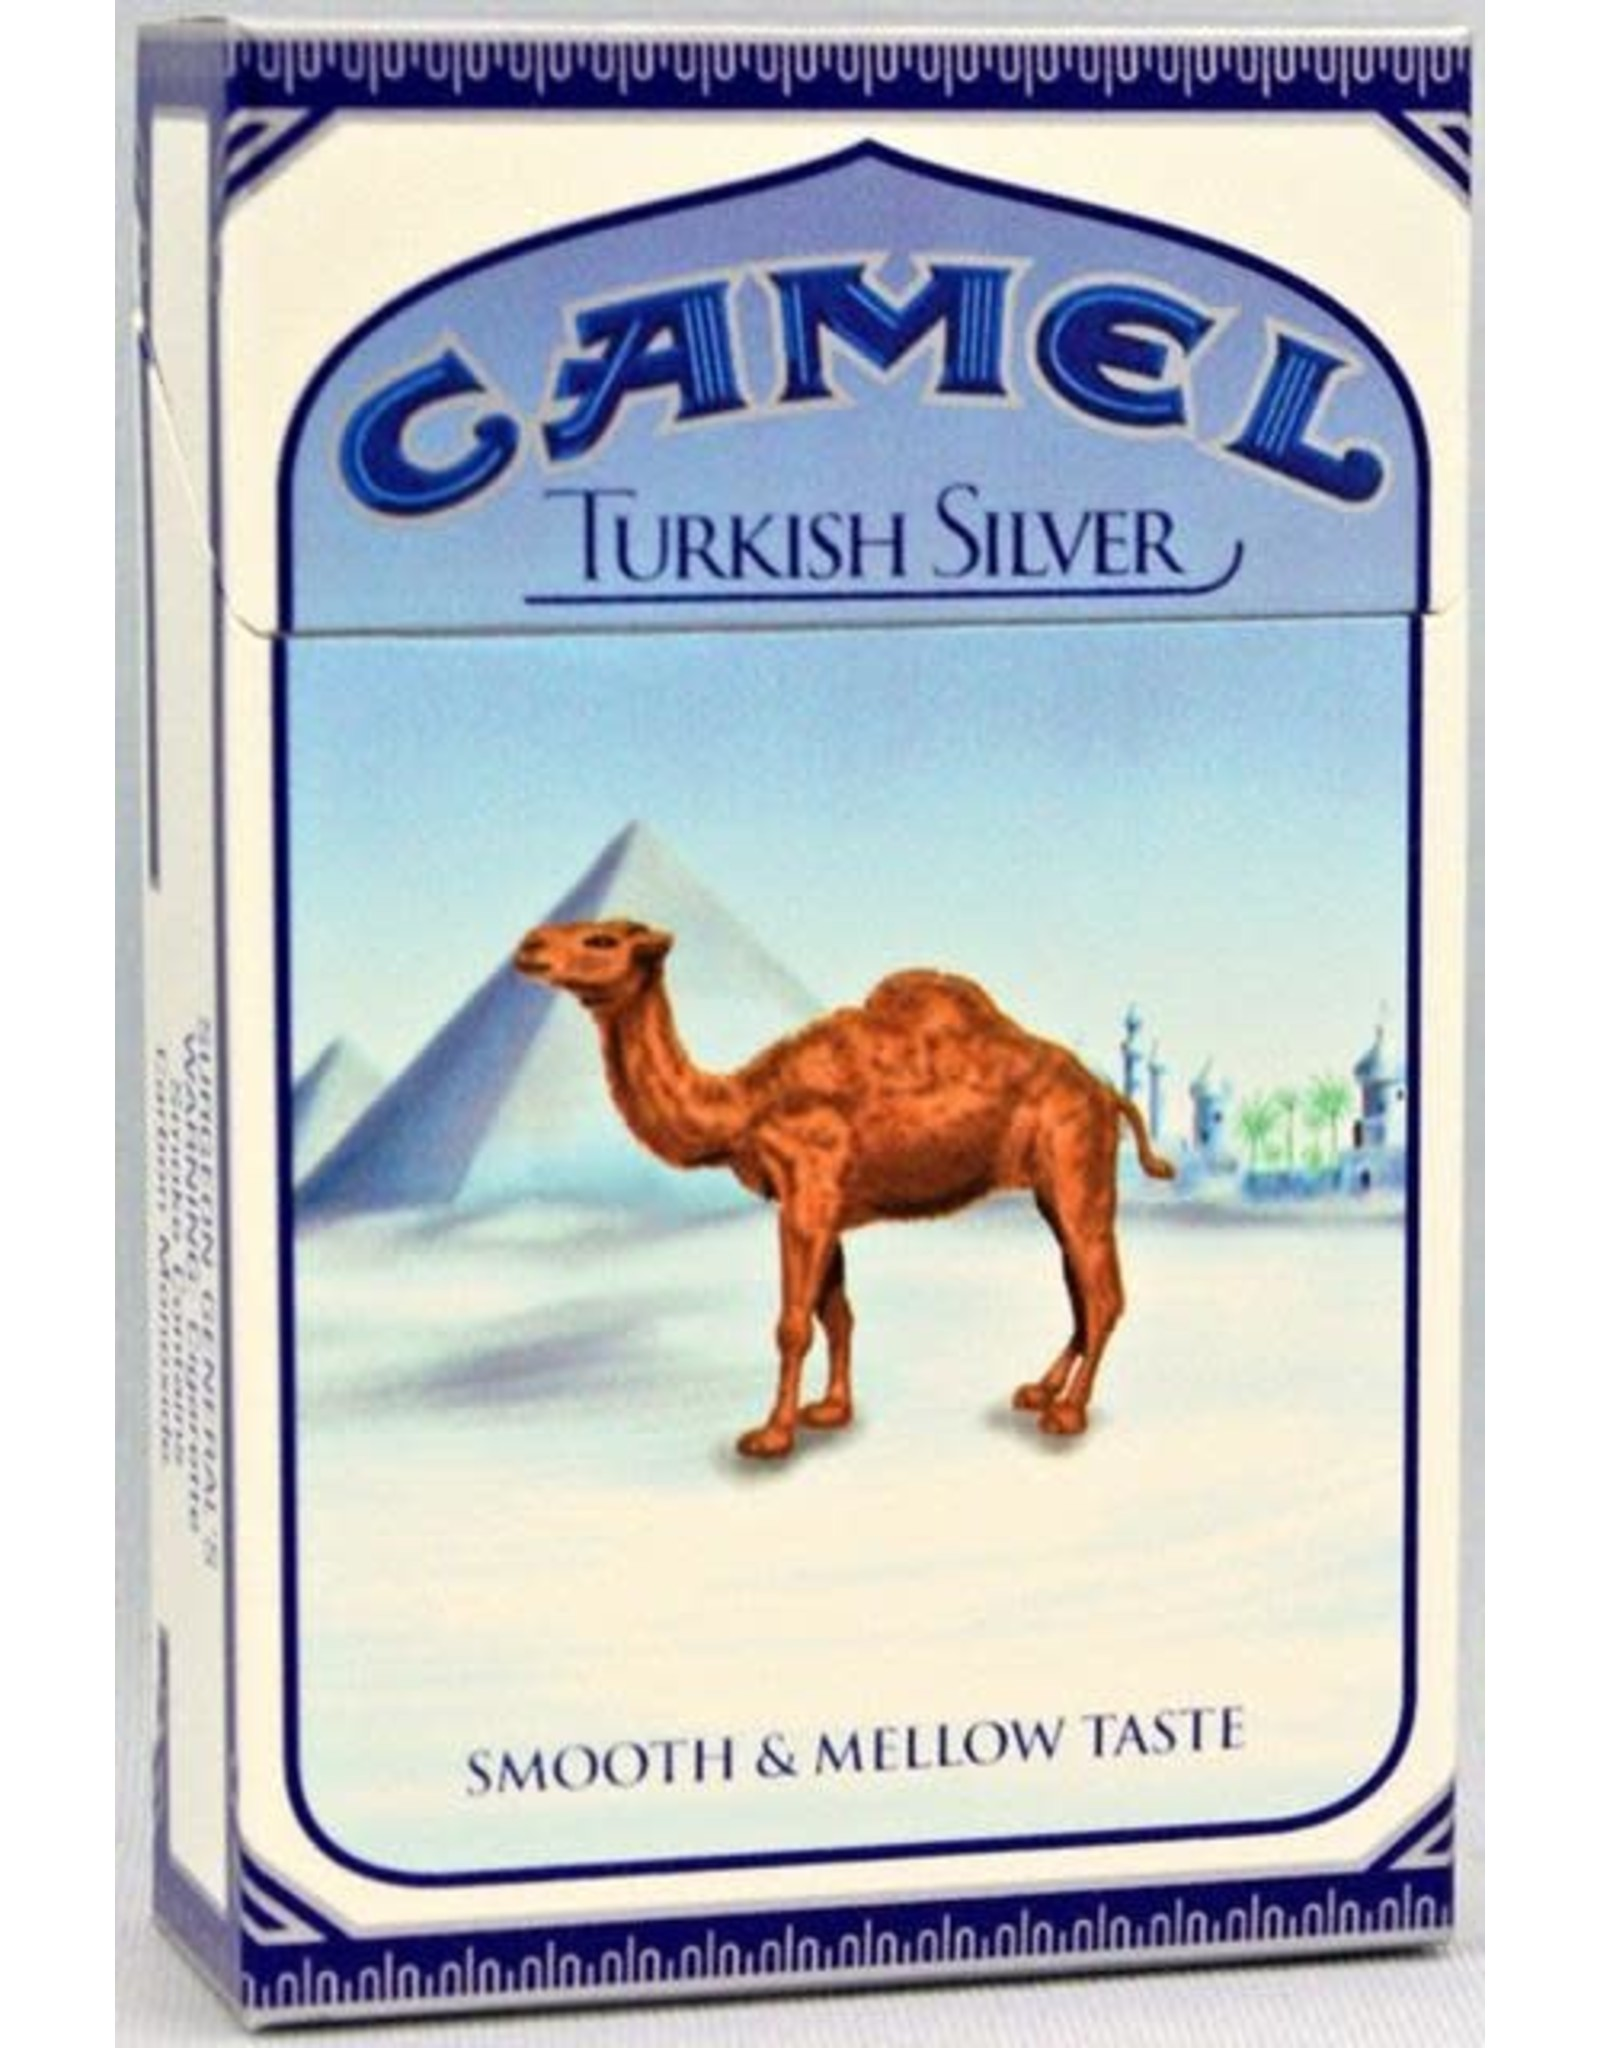 CAMEL TURKISH SILVER